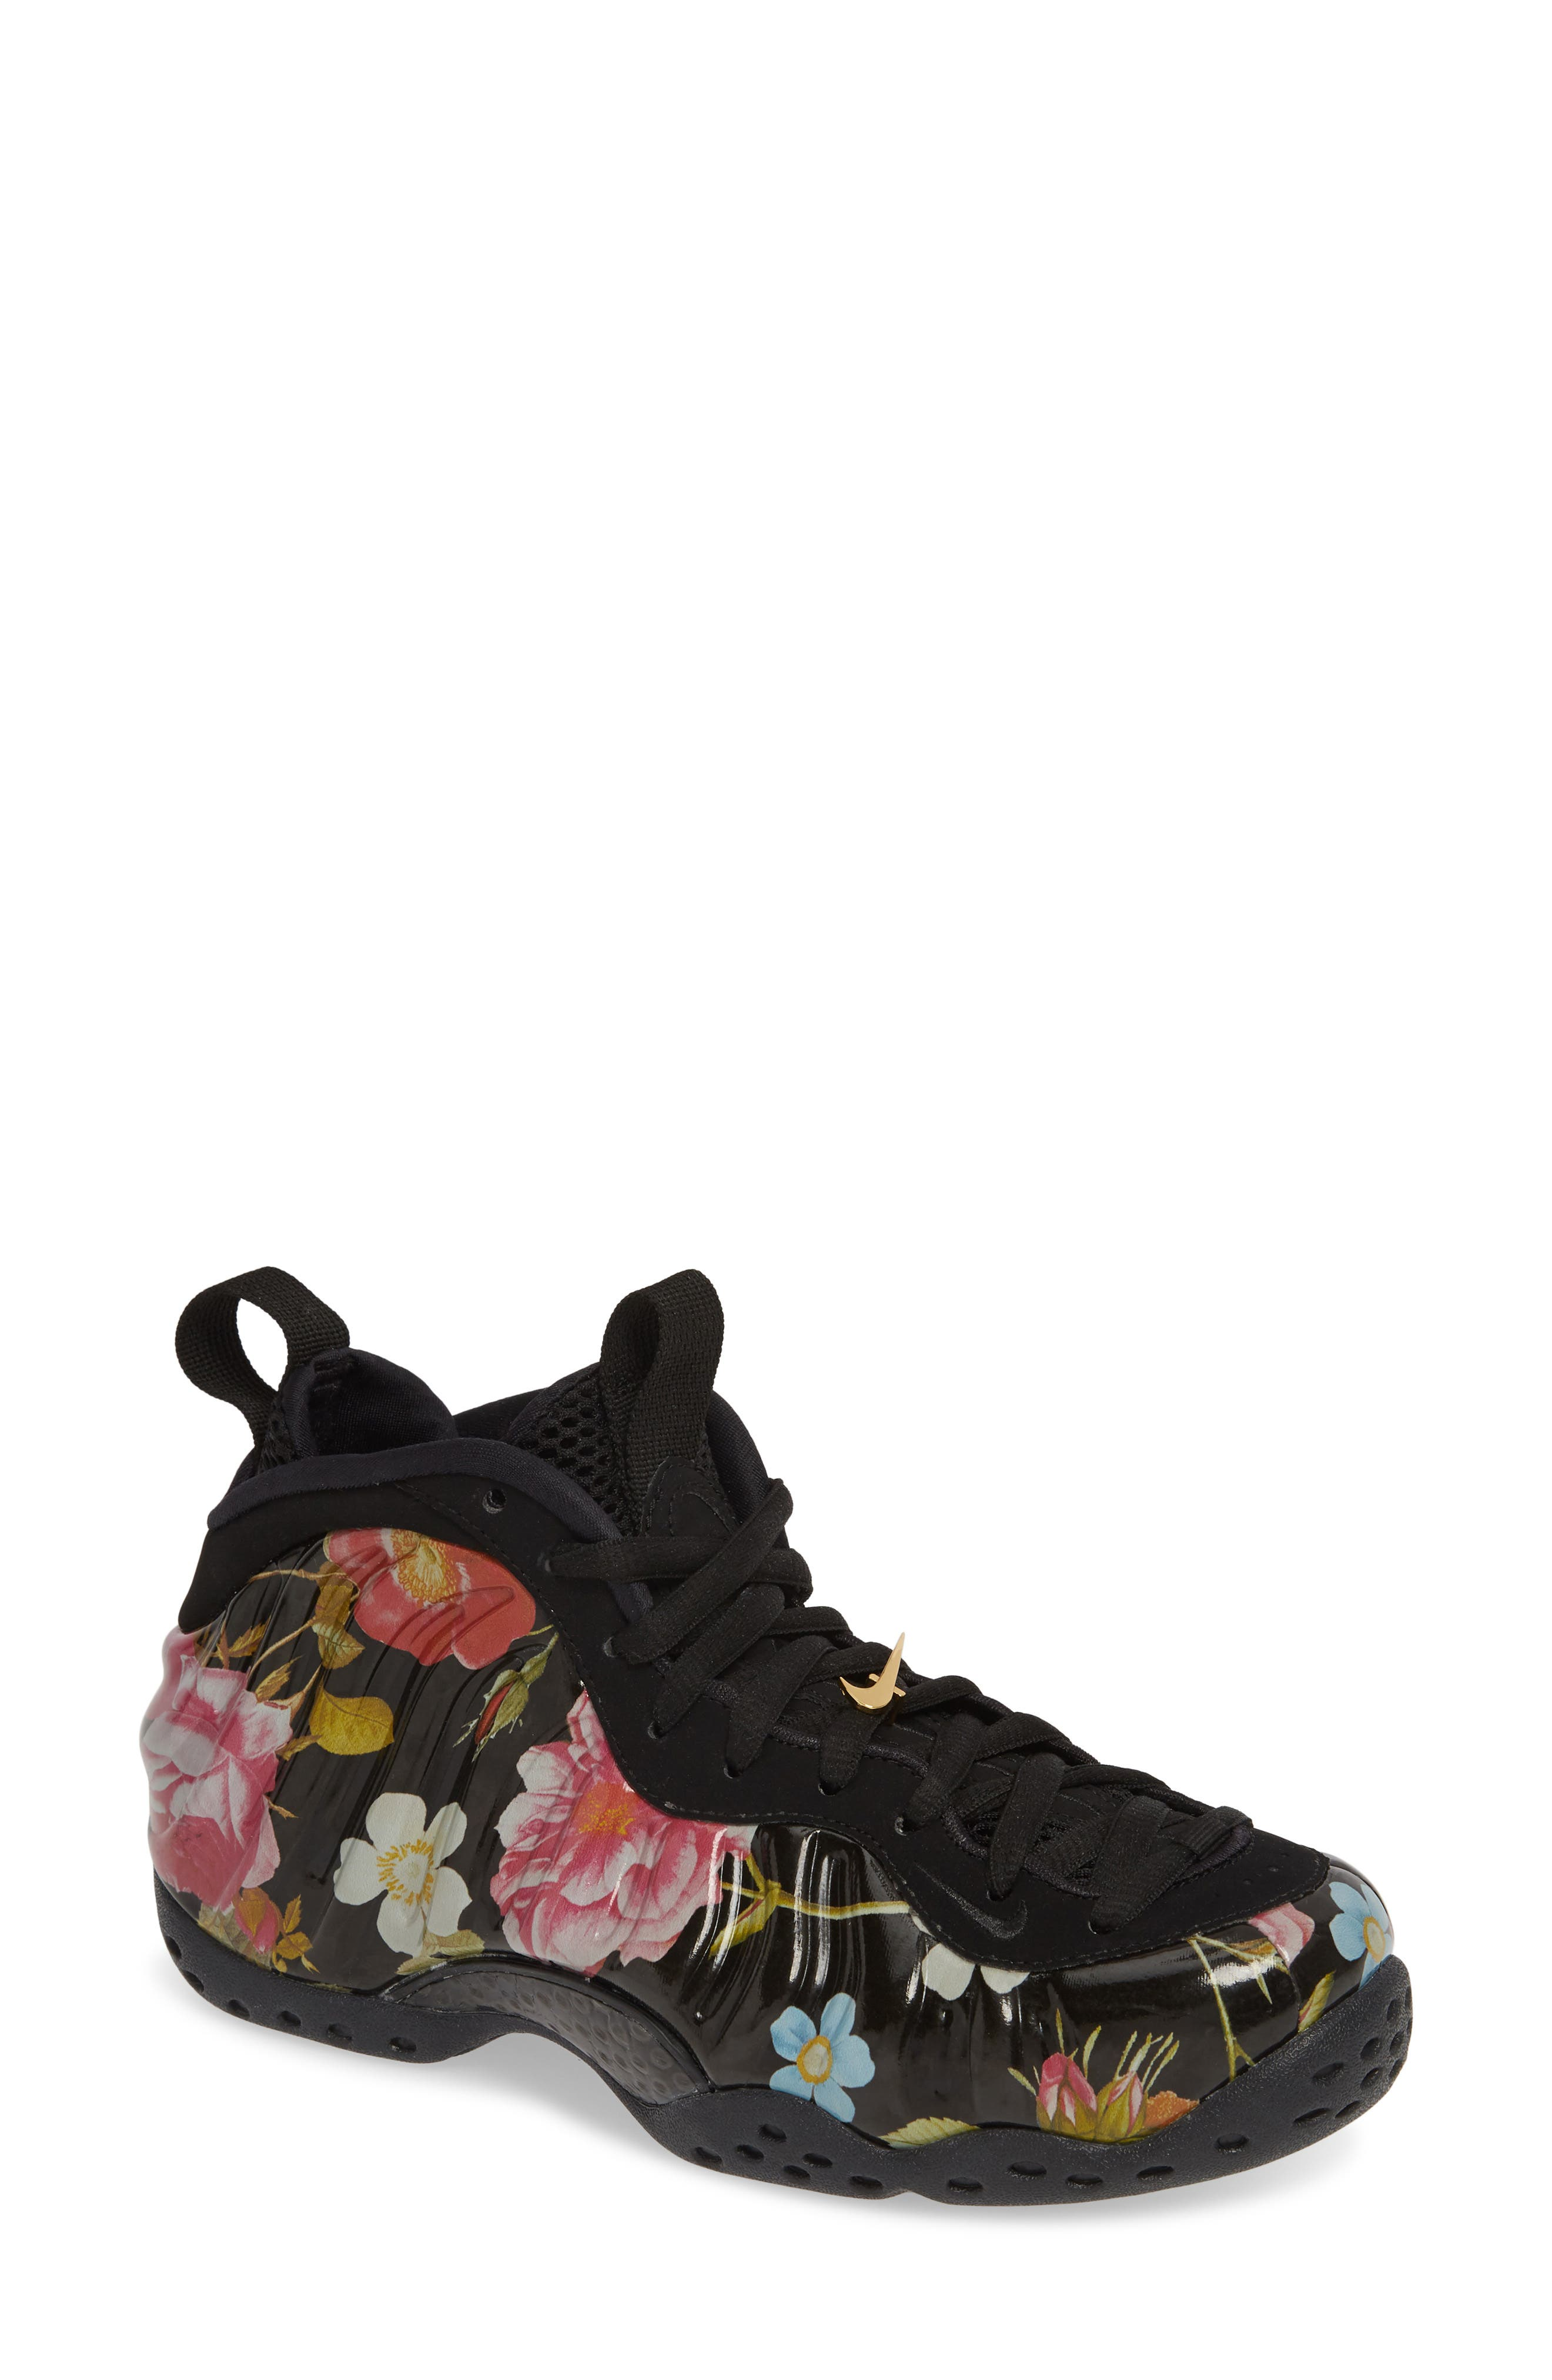 NIKE, Air Foamposite One Sneaker, Main thumbnail 1, color, BLACK/ BLACK-METALLIC GOLD